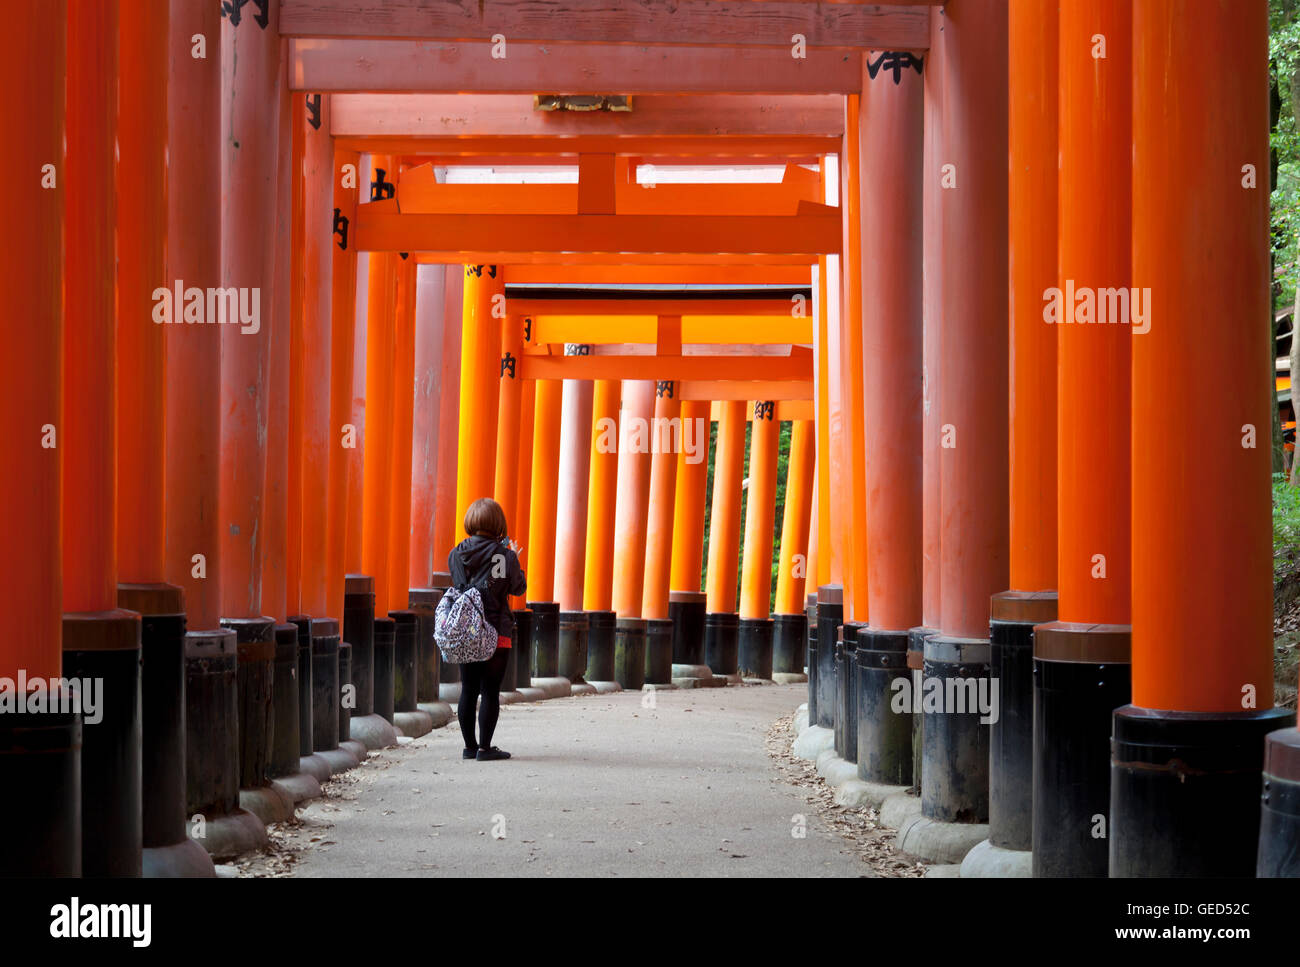 Fushimi Inari shrine, one of famous landmarks in Kyoto, Japan - Stock Image